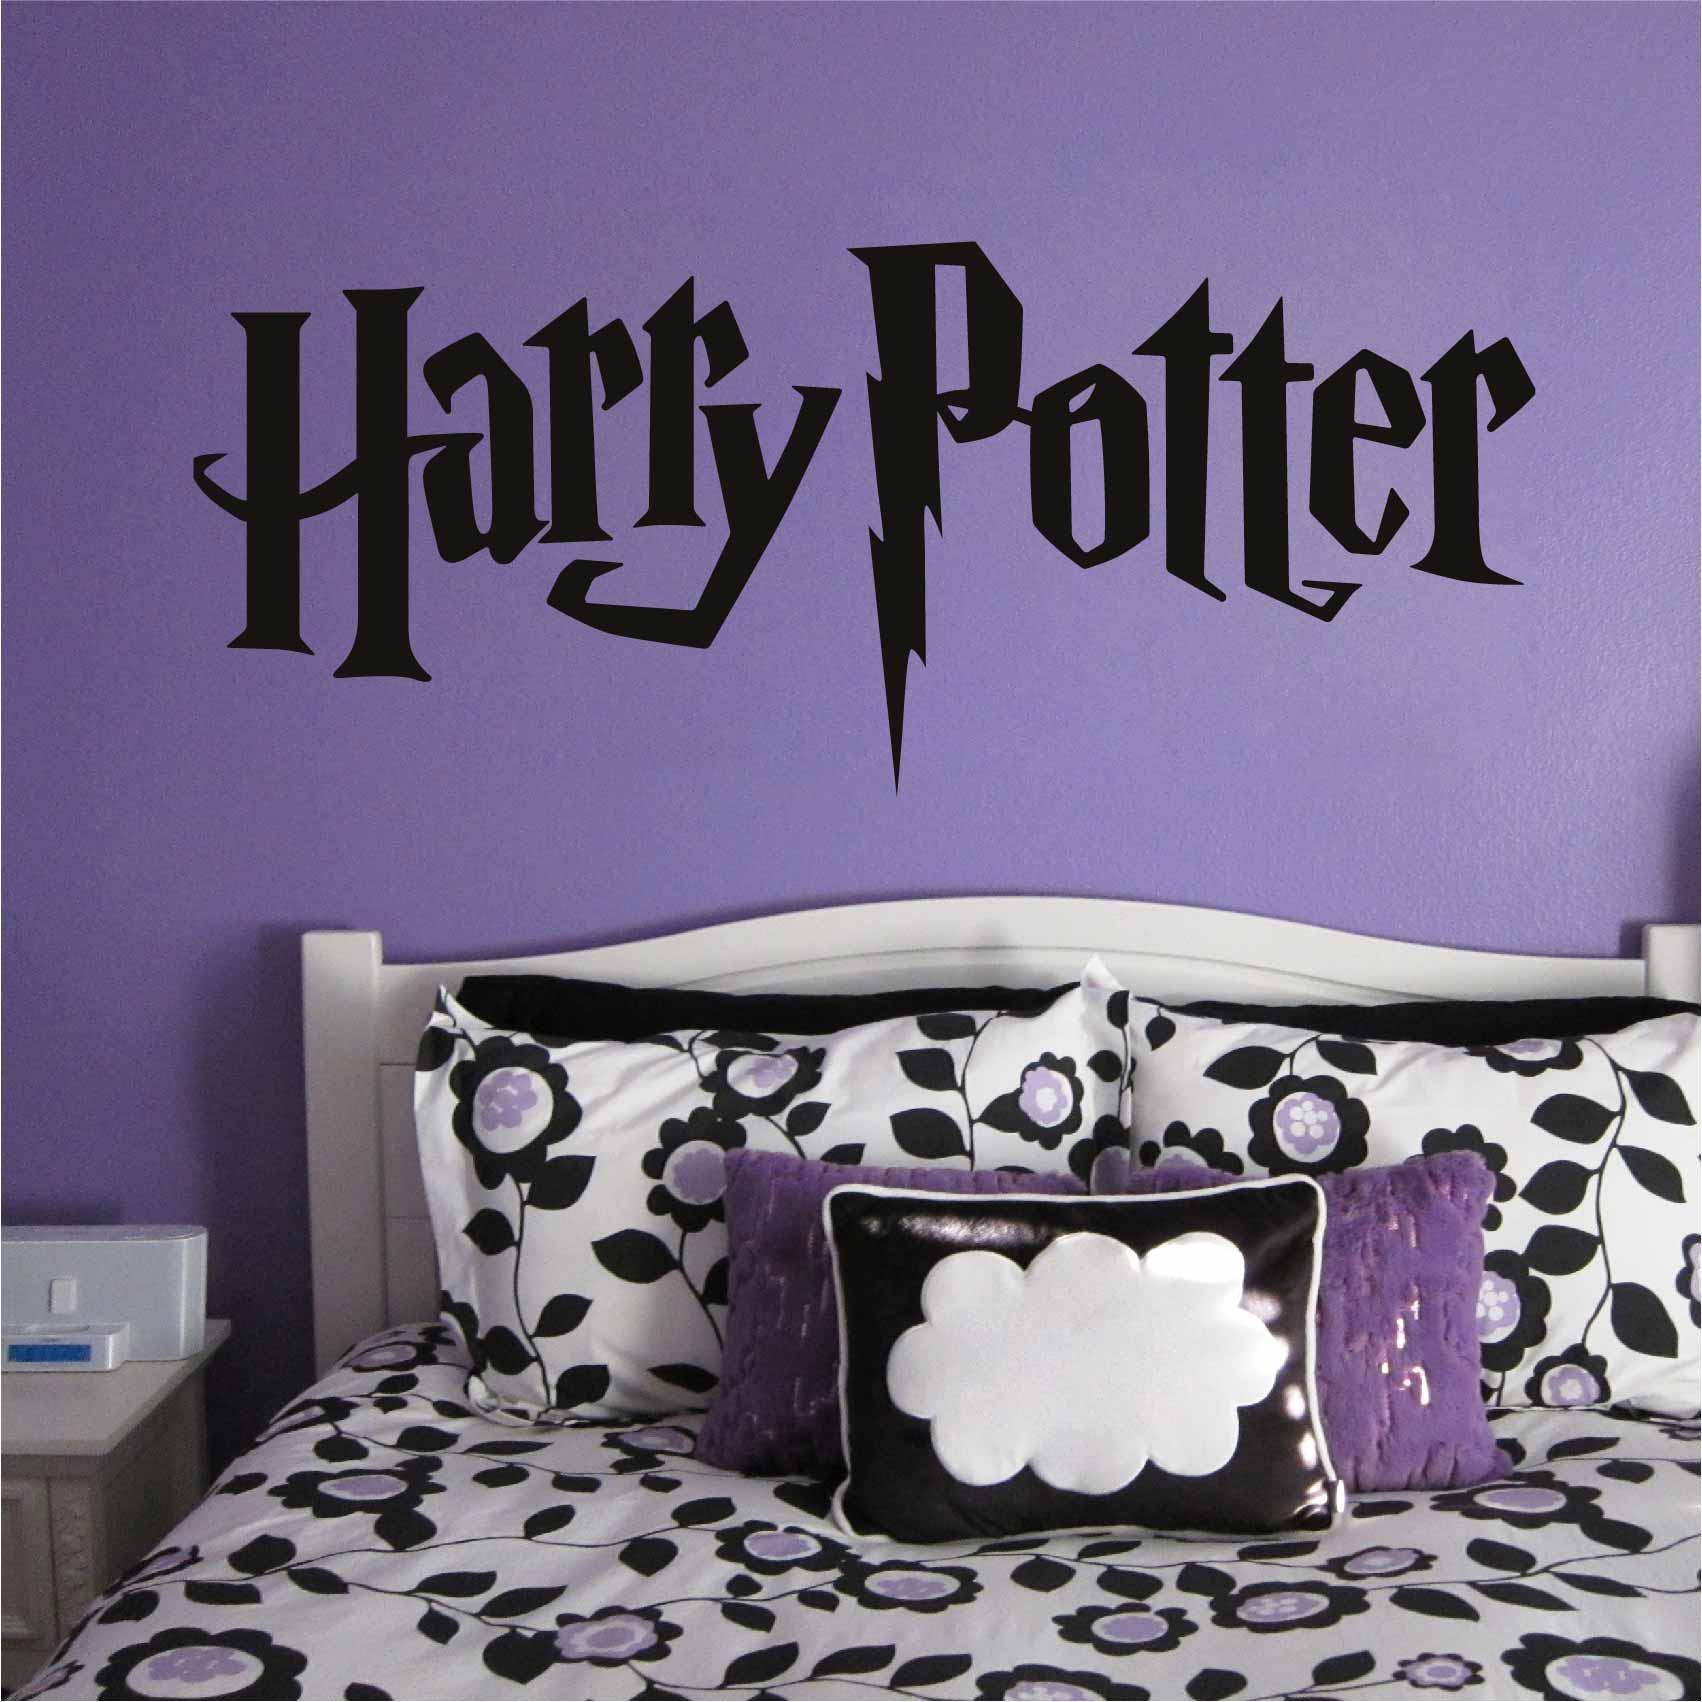 stickers muraux harry potter trainingsstalmaikewiebelitz. Black Bedroom Furniture Sets. Home Design Ideas